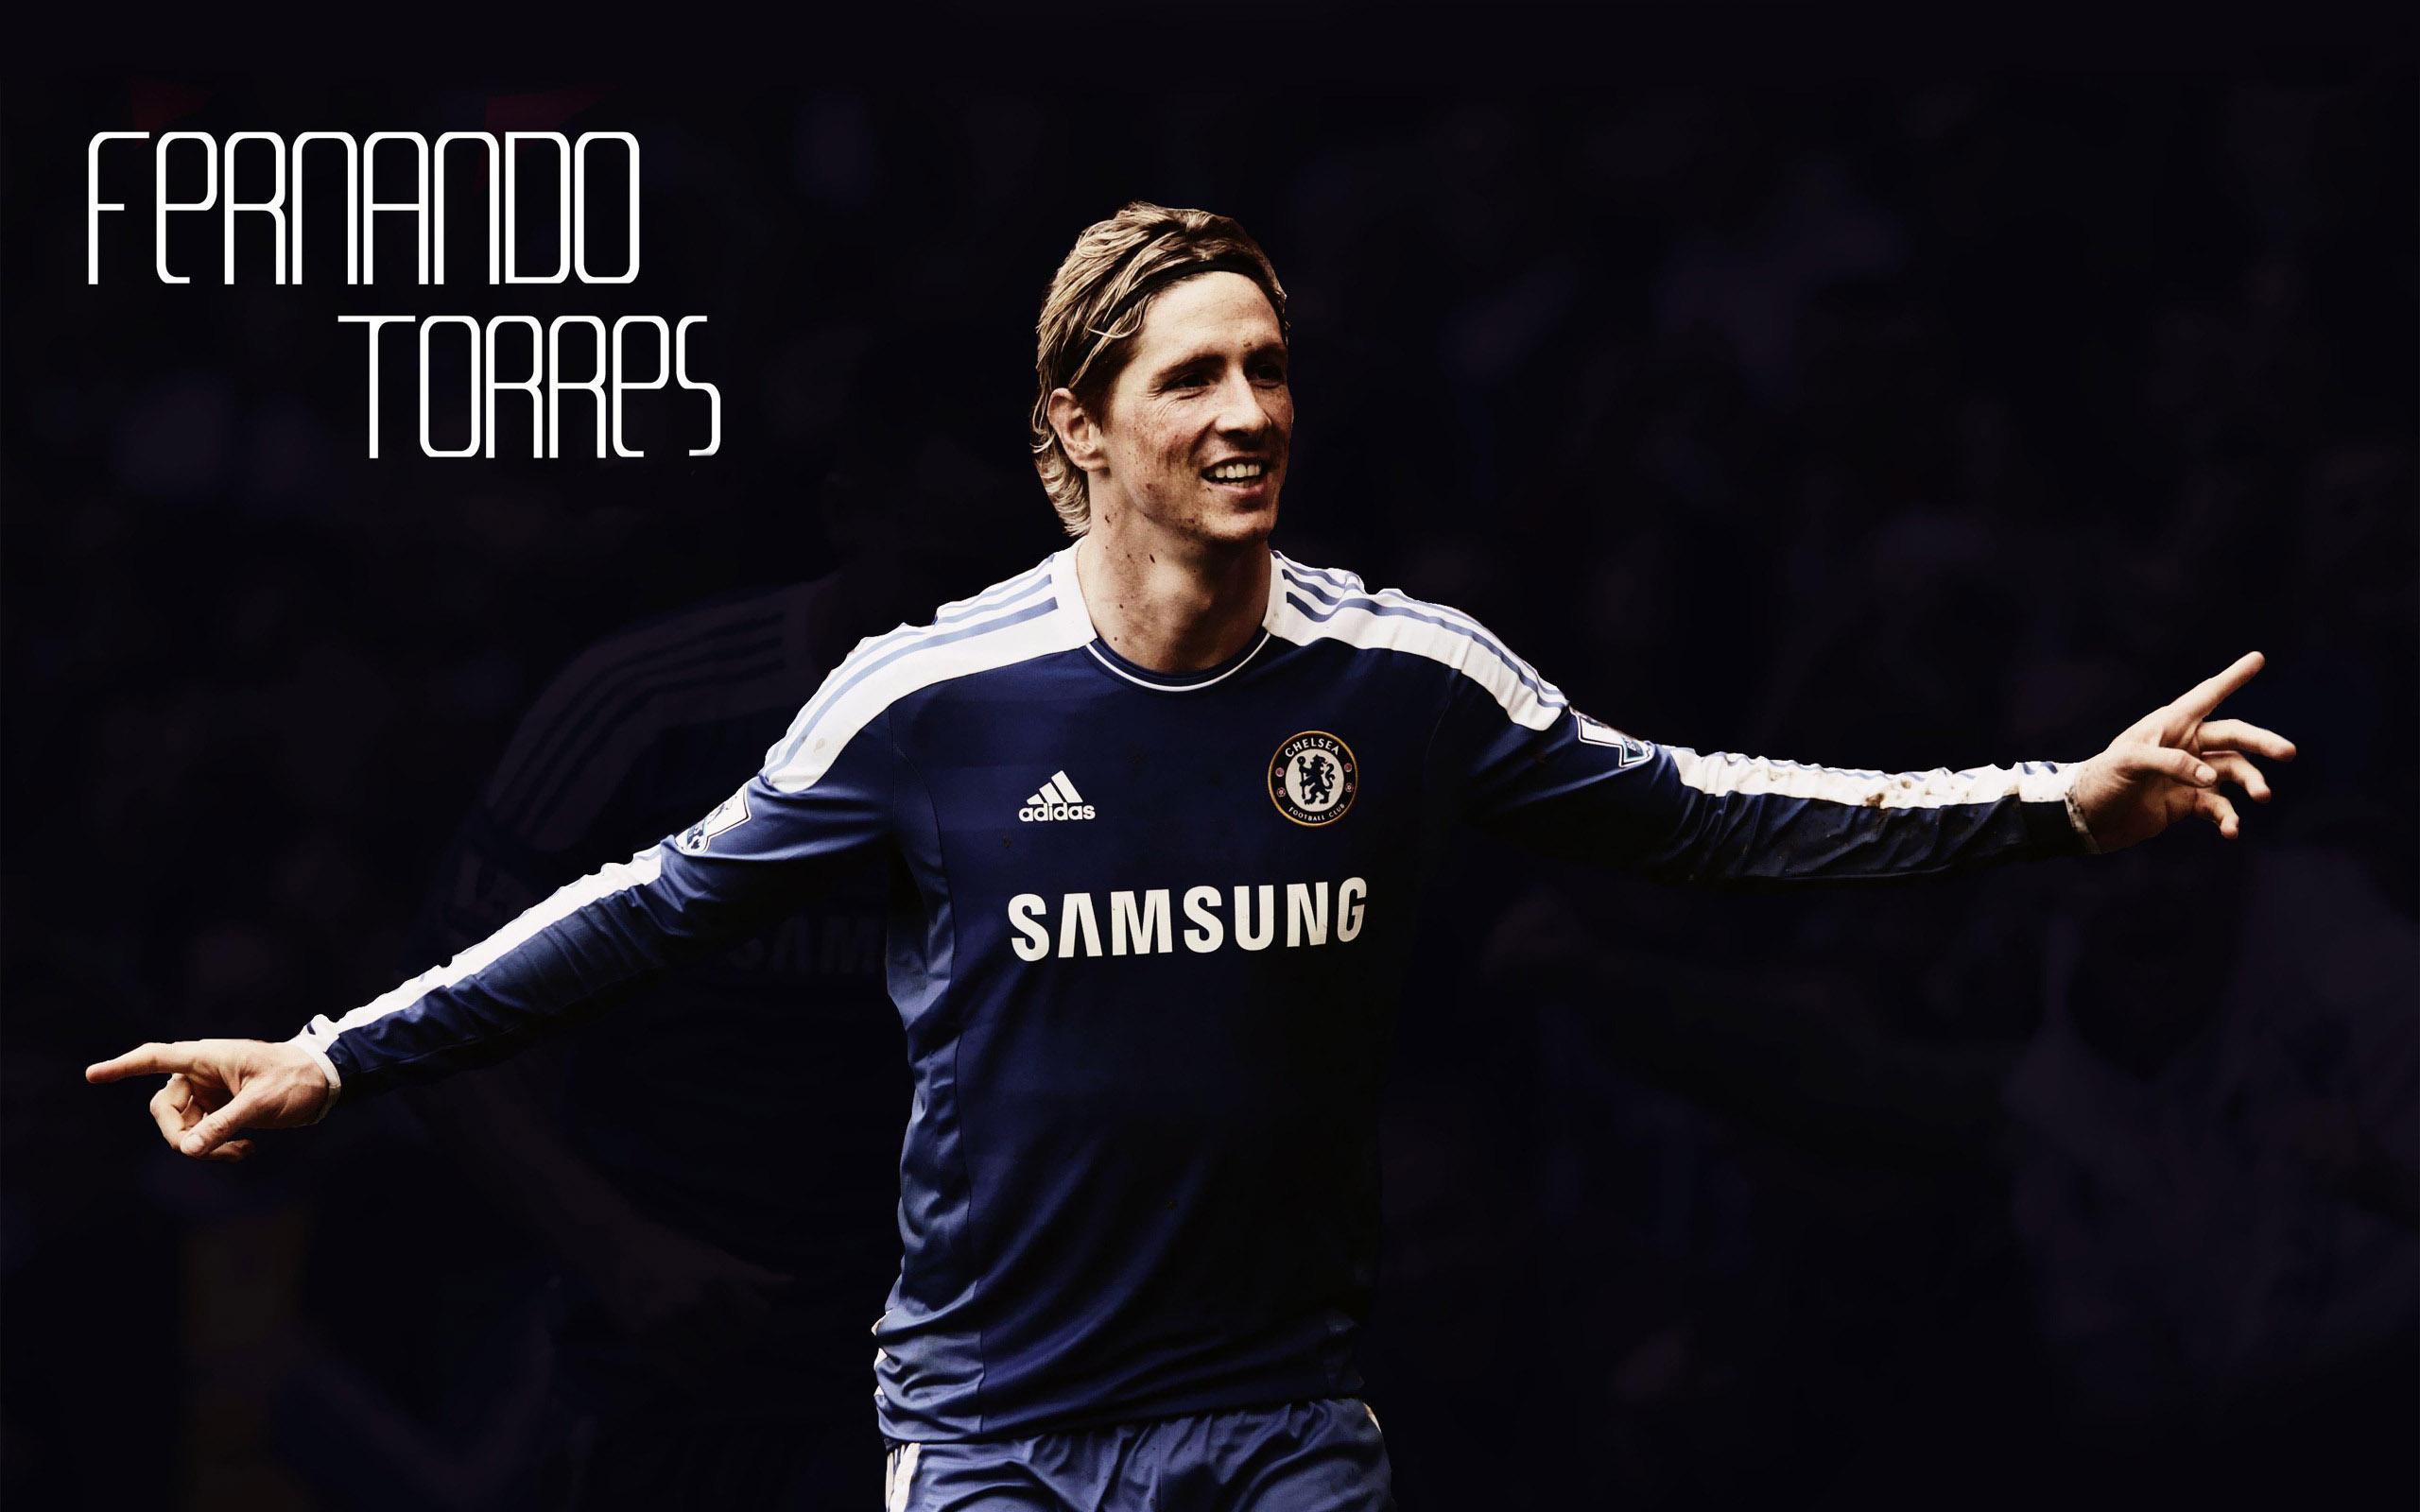 Fernando Torres Chelsea Wallpaper 2560x1600